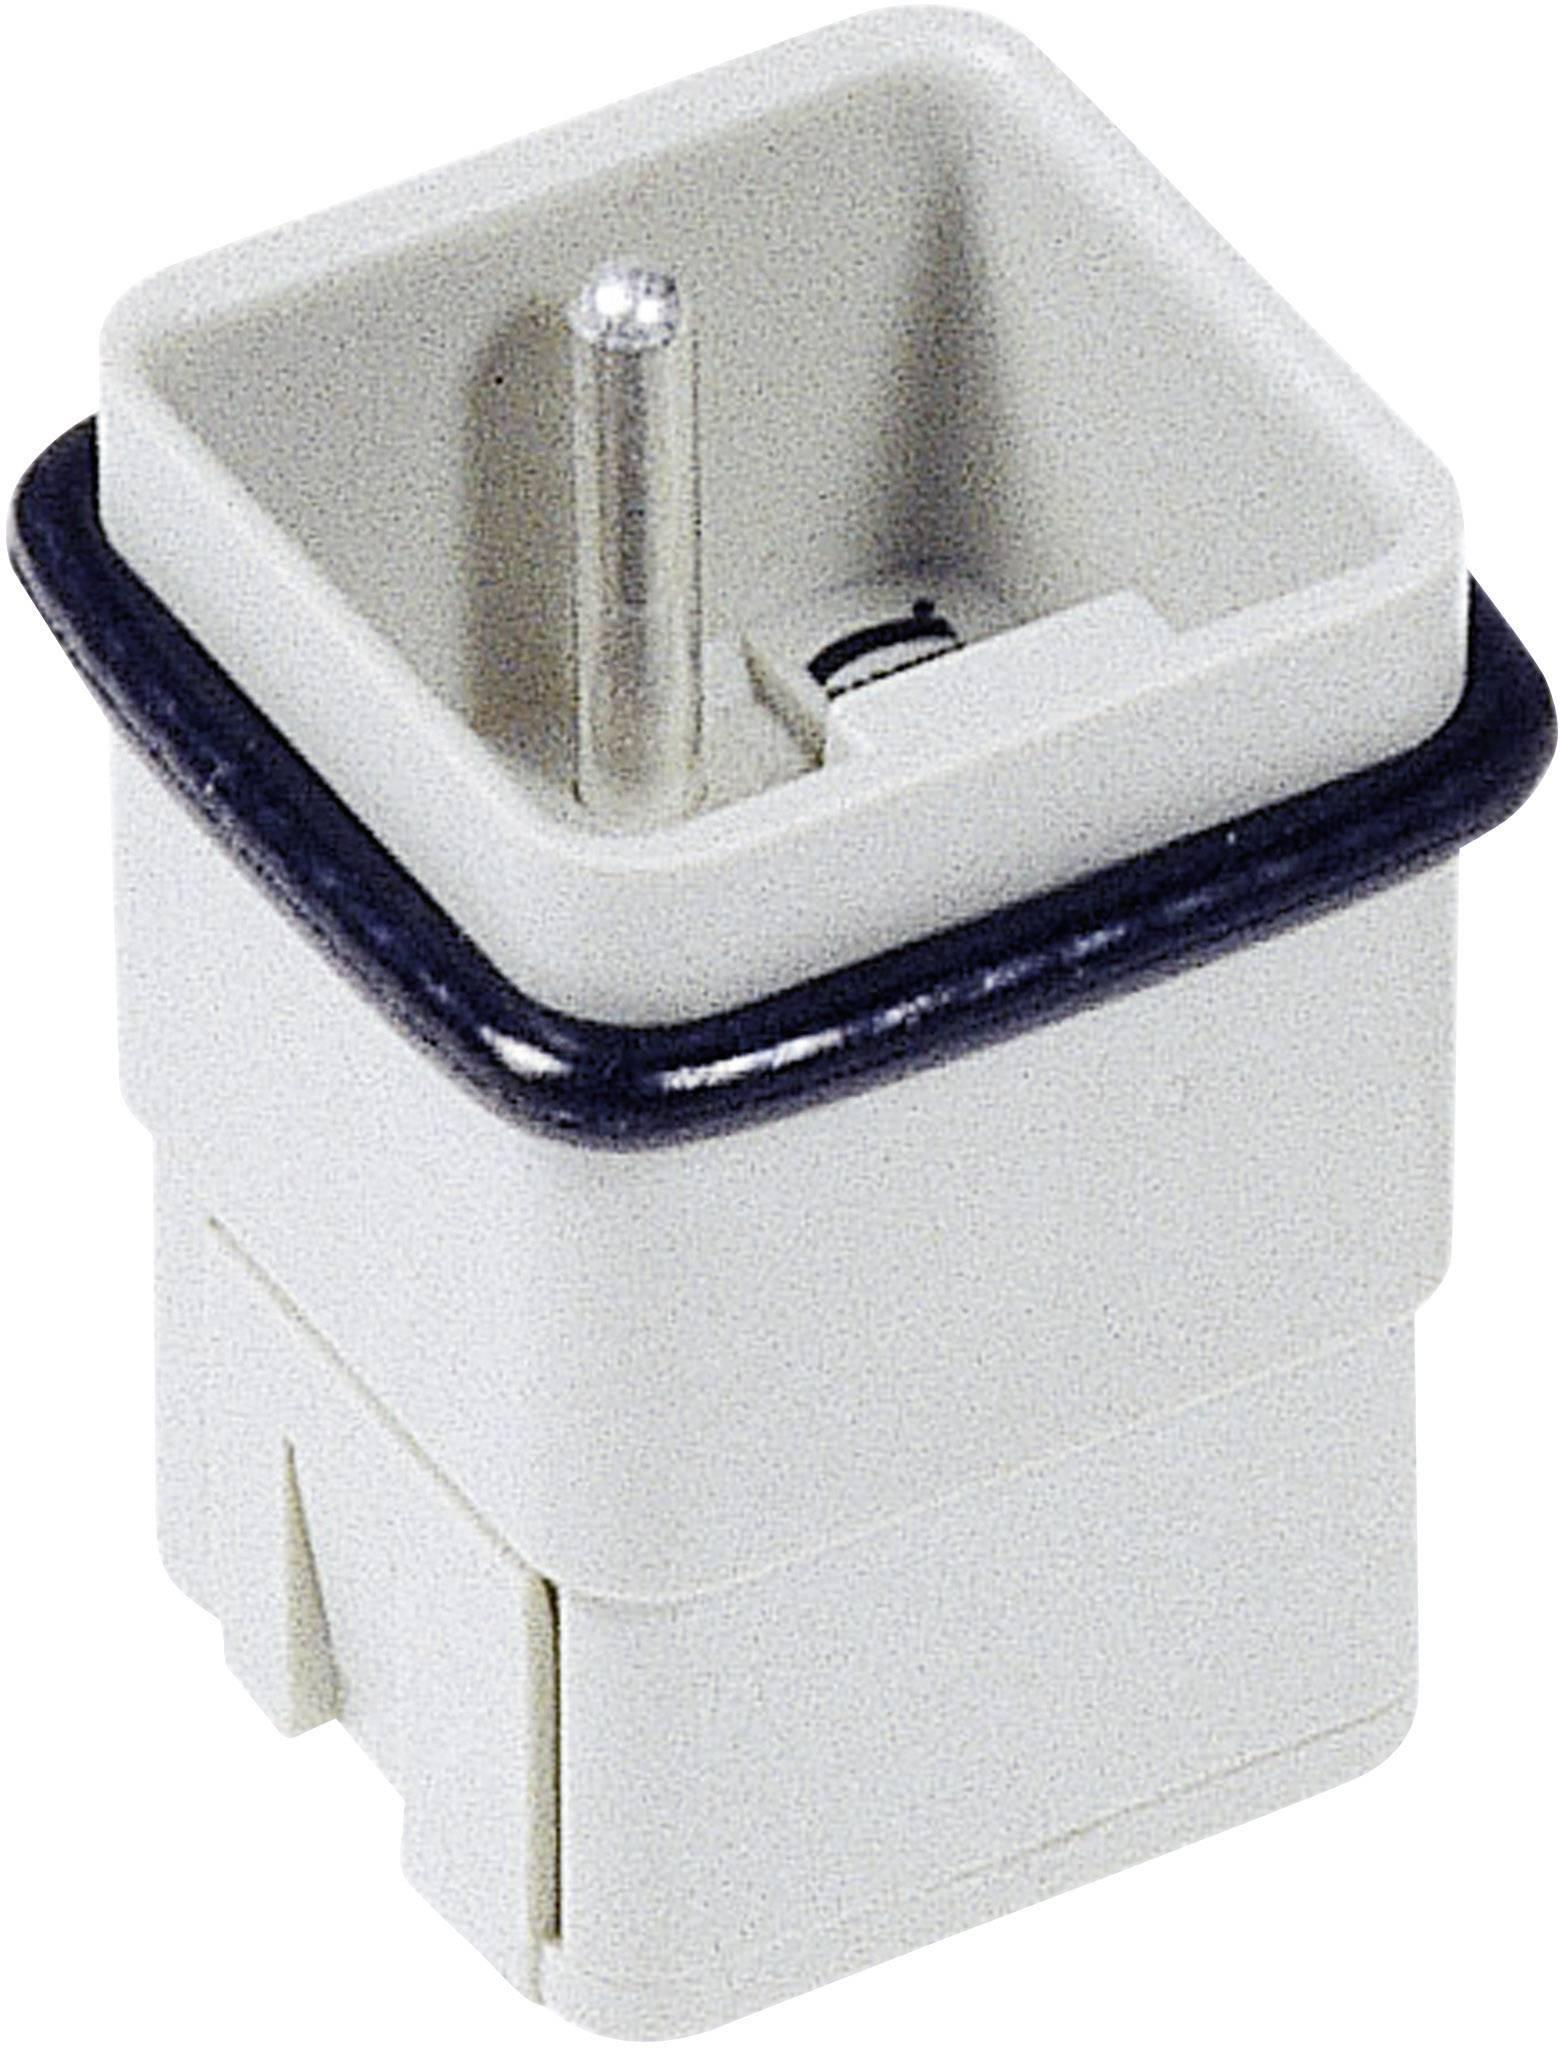 Vložka pinového konektoru Harting Han® Q 09 12 005 3001, 5 + PE, krimpované připojení, 1 ks